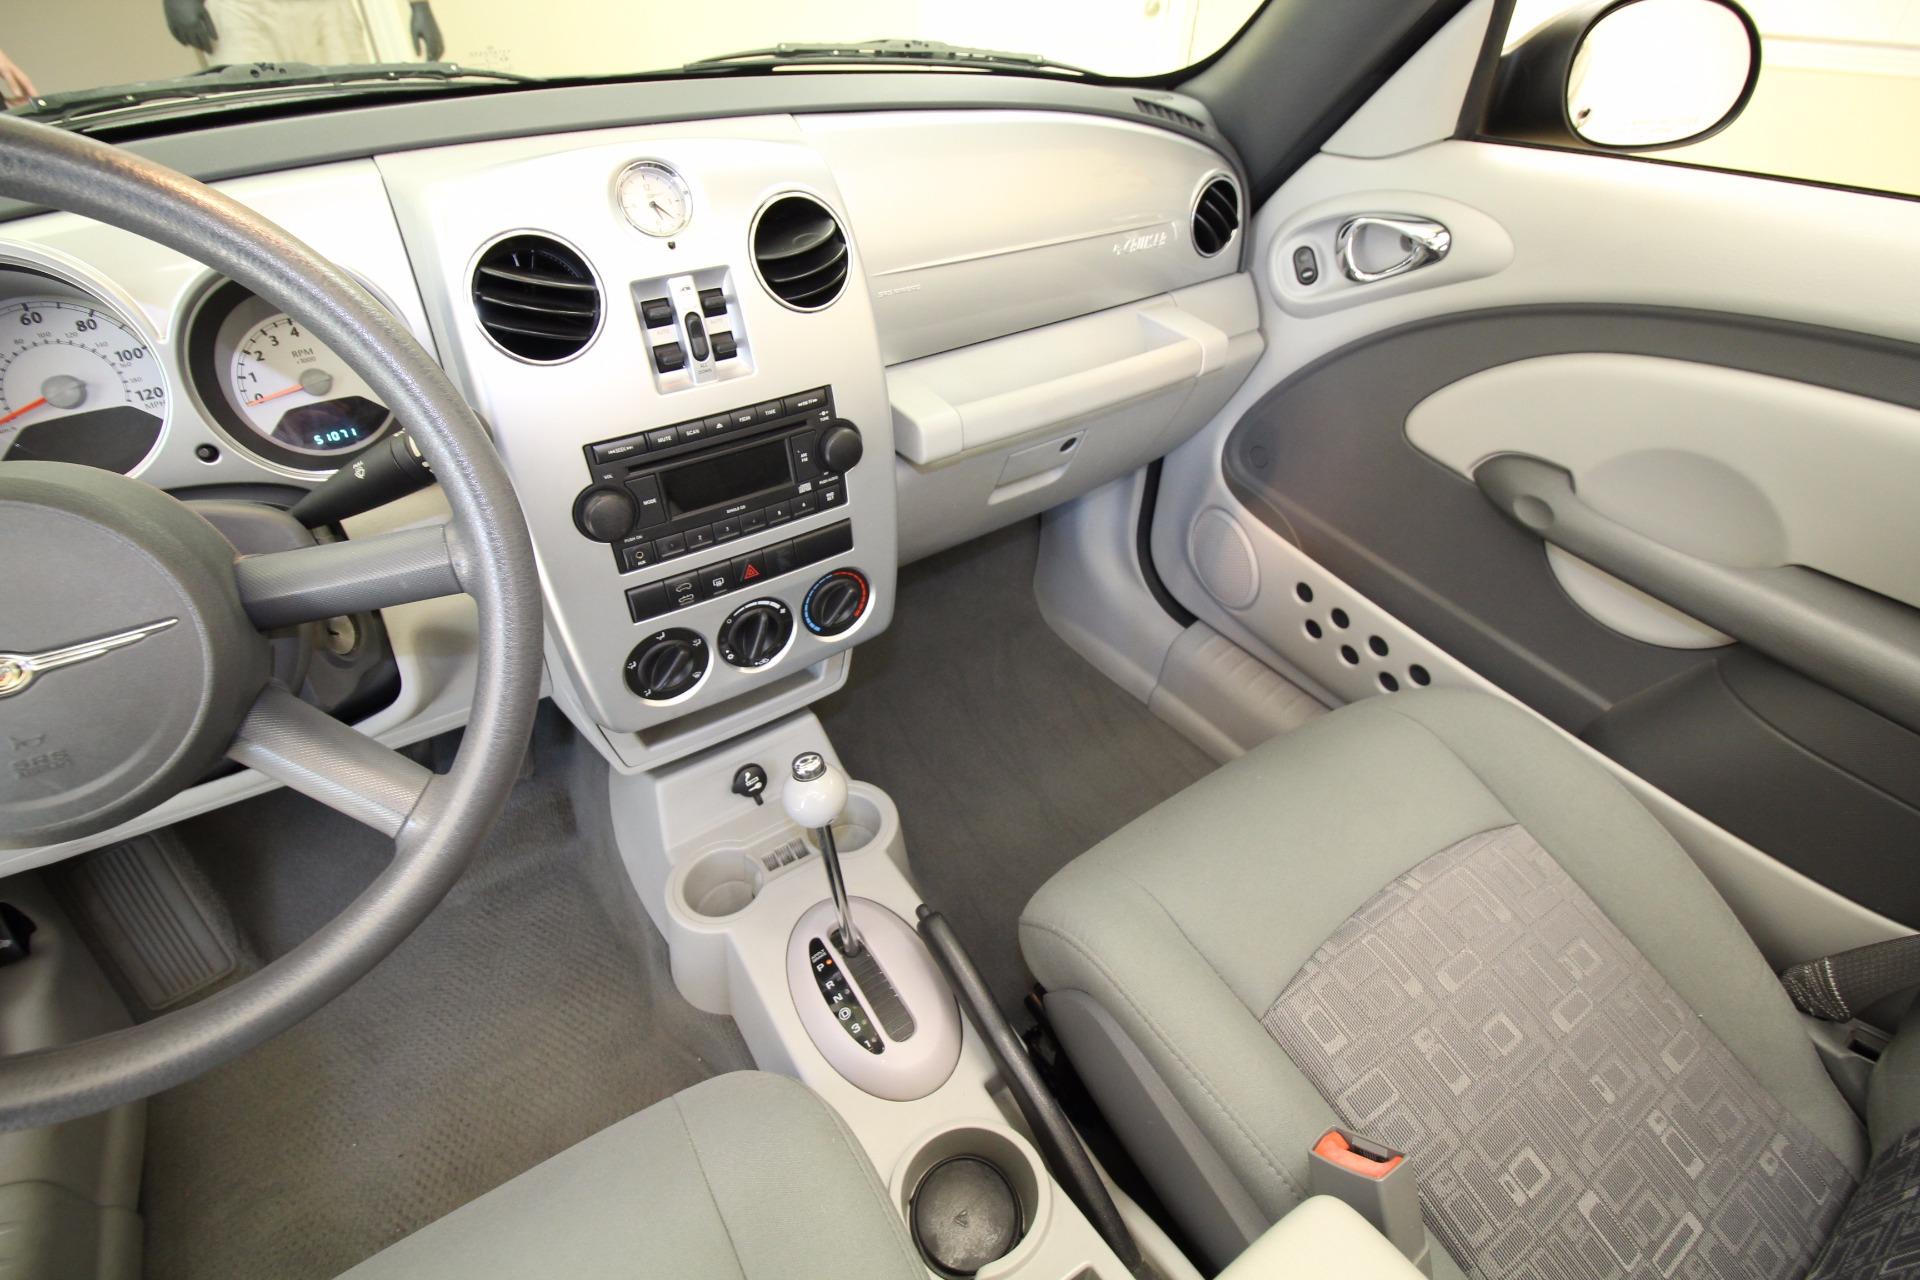 Used 2007 Chrysler PT Cruiser Convertible | Albany, NY